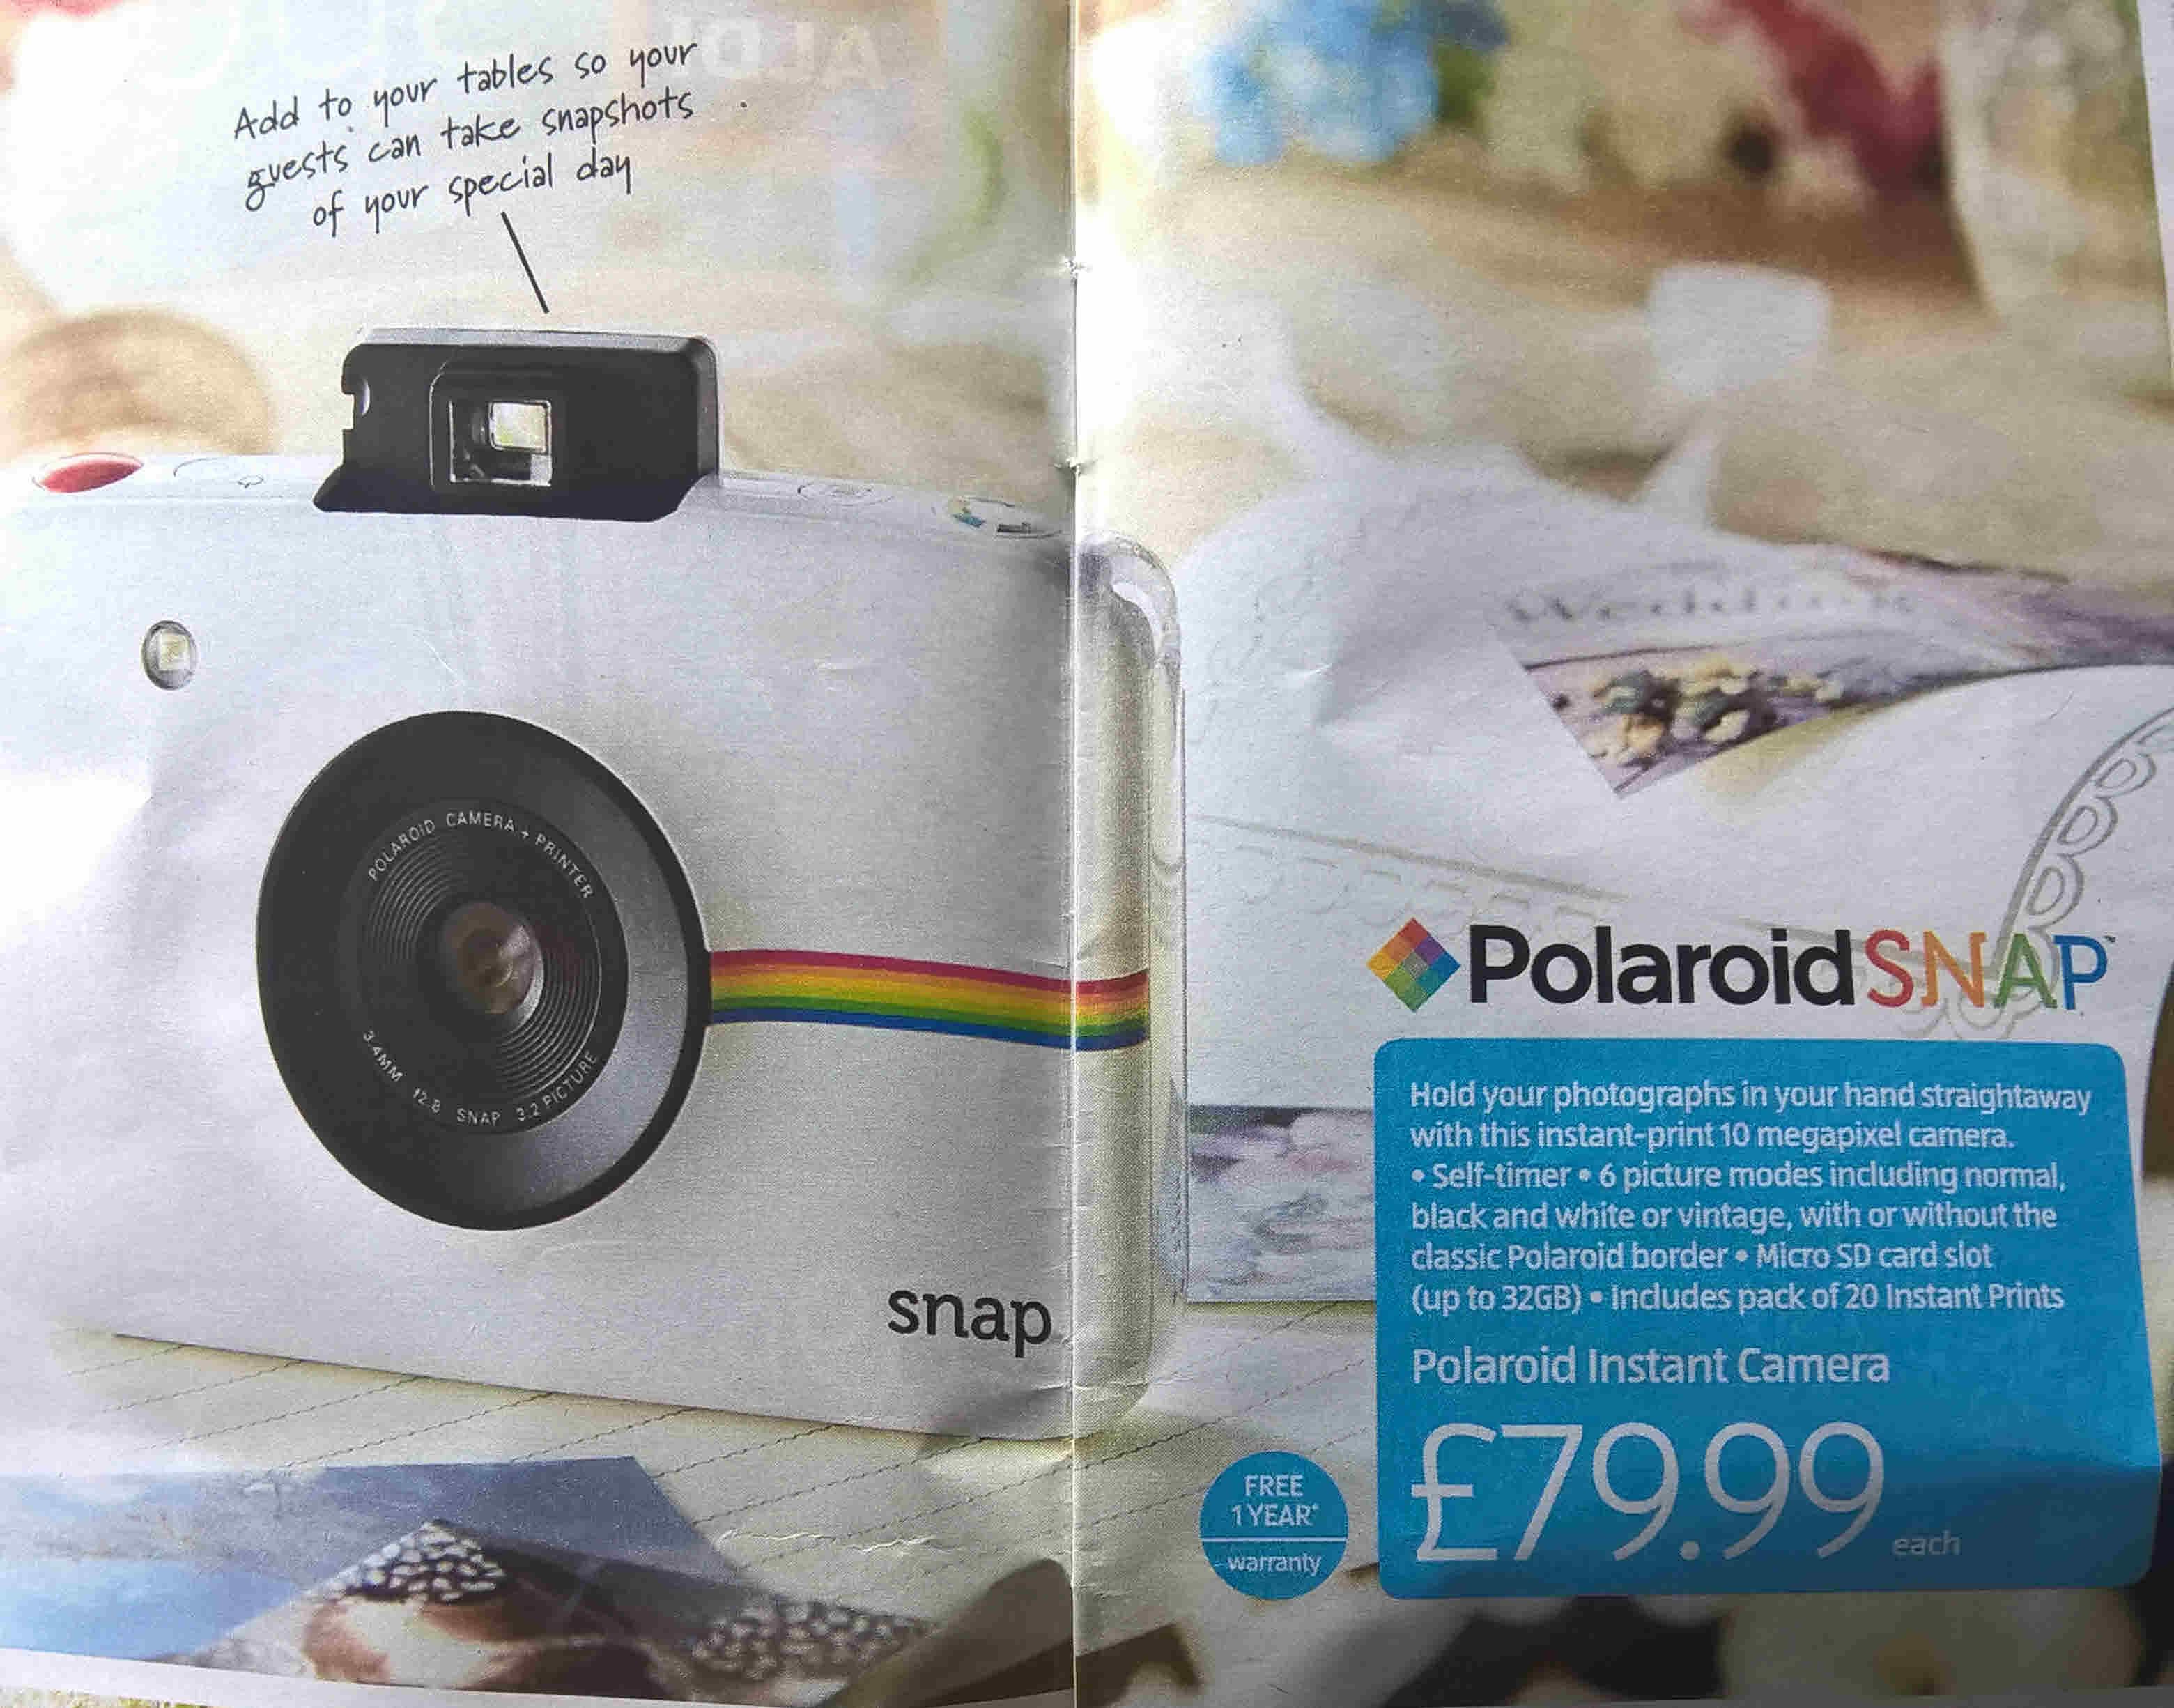 Polaroid Camera Urban Outfitters Uk : Polaroid snap instant print digital camera aldi £